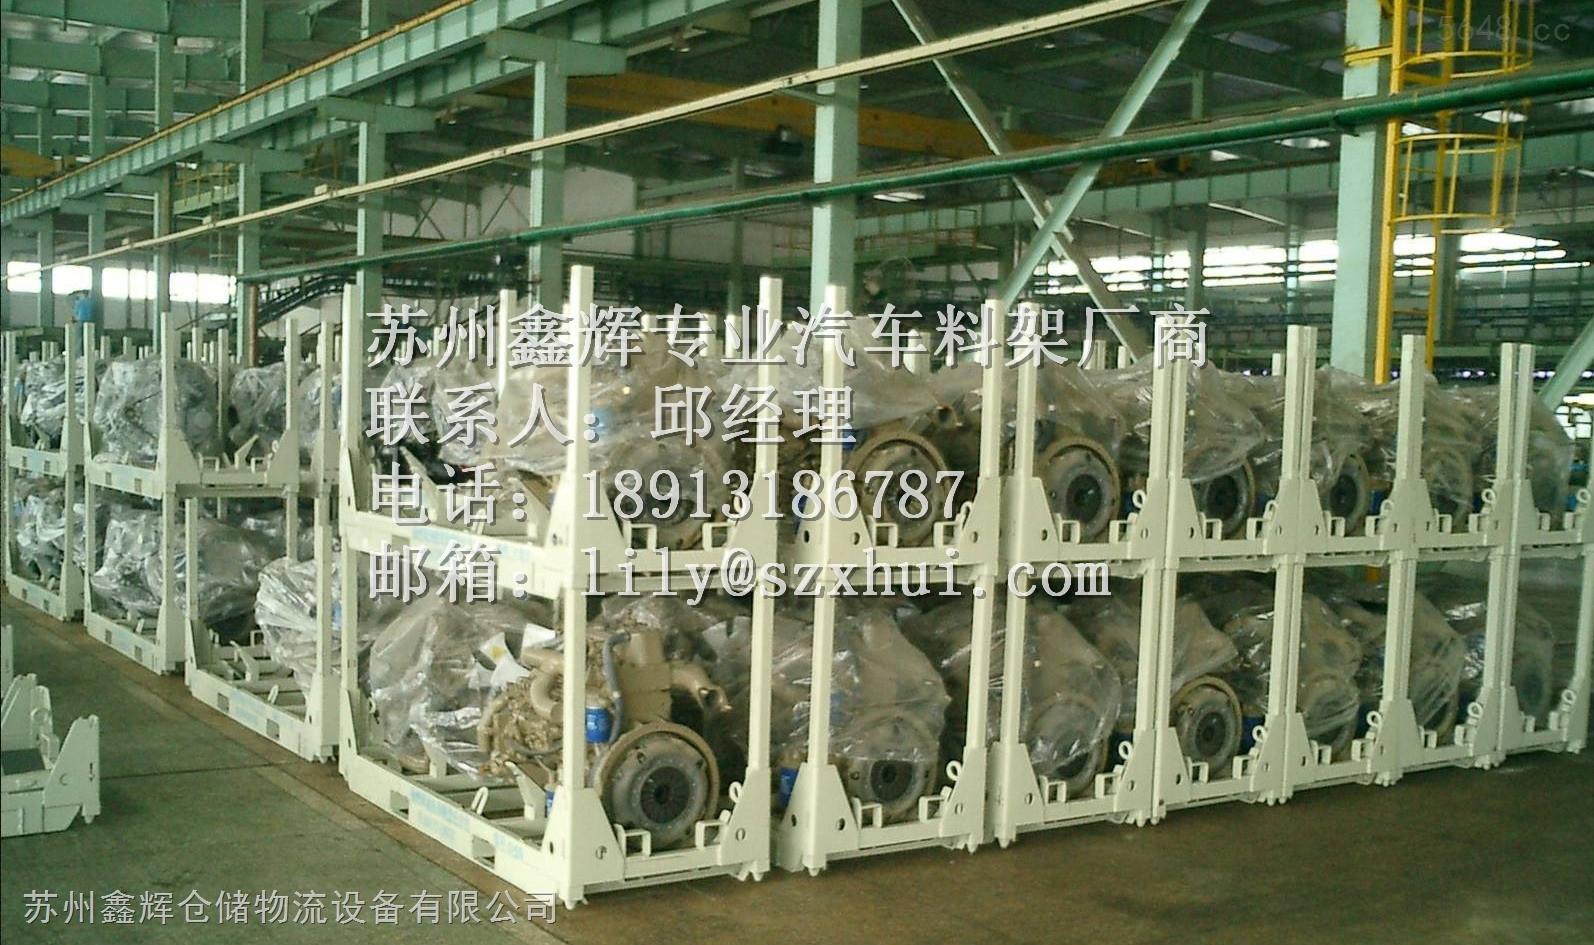 xh 苏州汽车料架/厂家直销/生产汽车料架/设计汽车料架